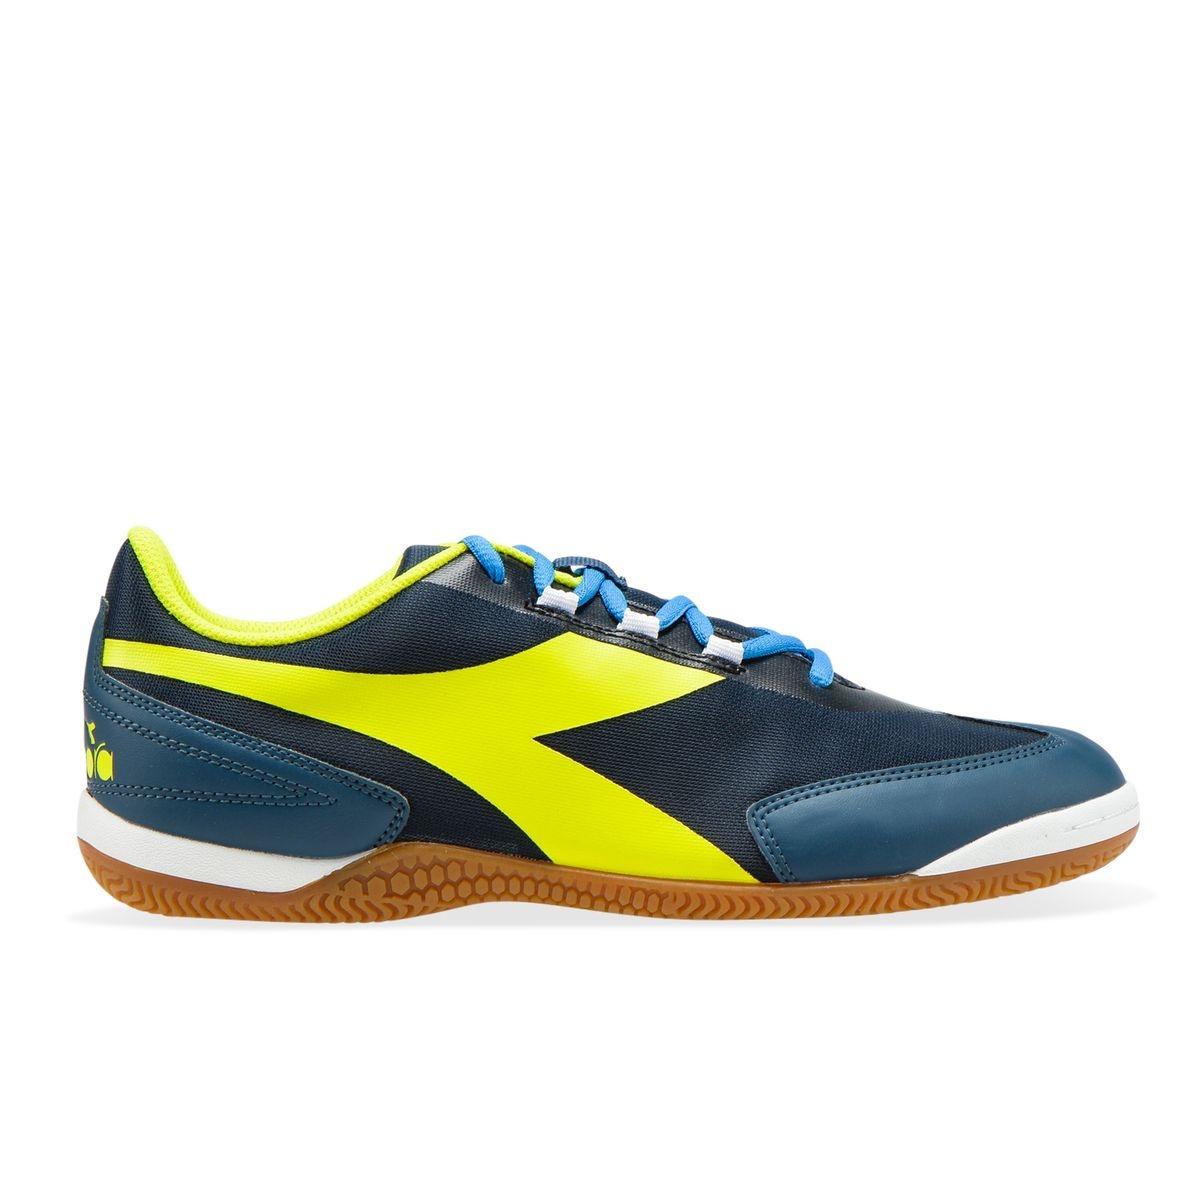 Chaussure de football FUTINHA ID